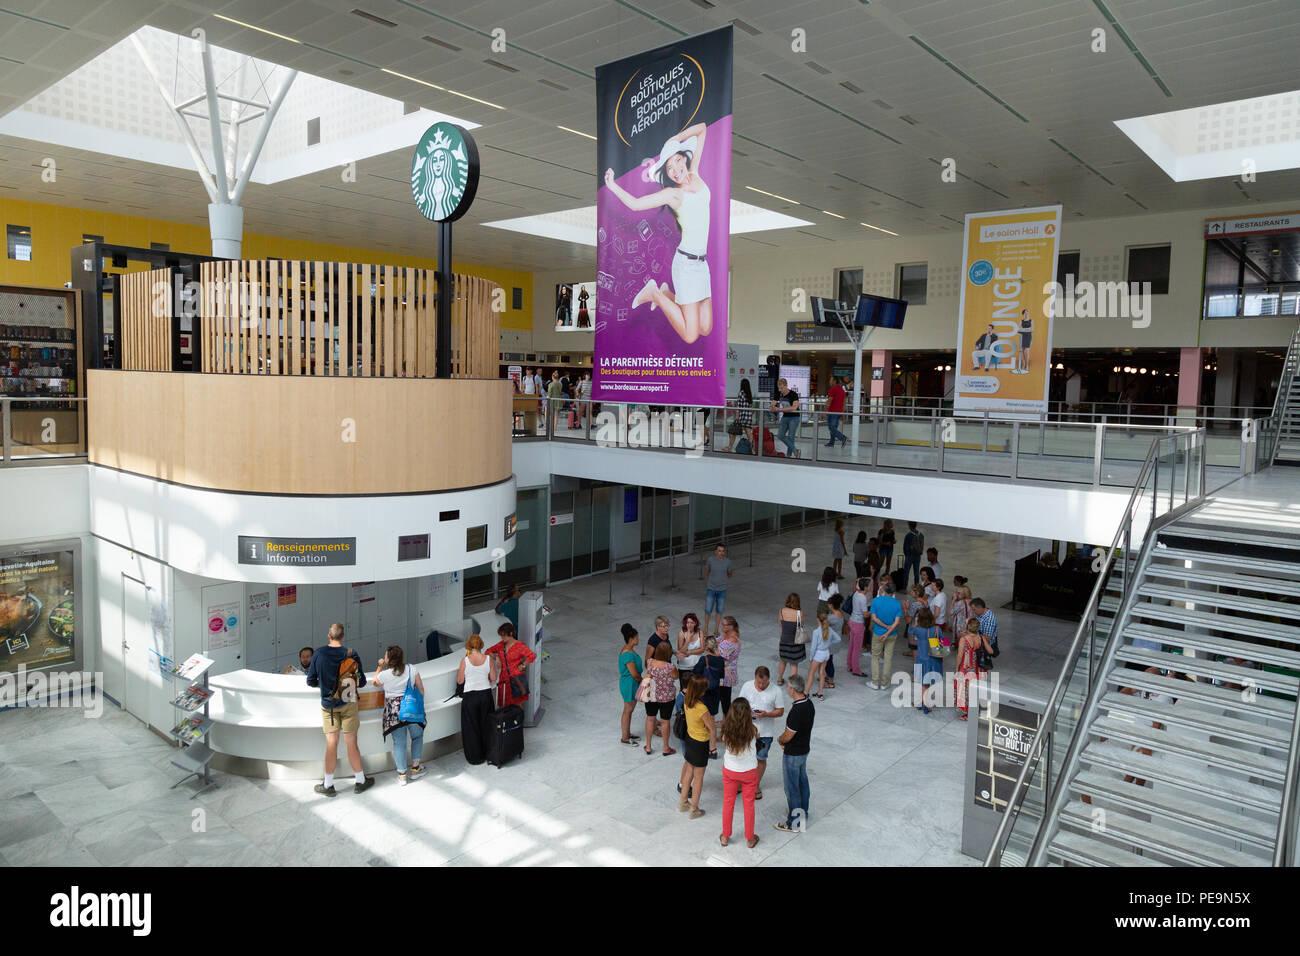 Air passengers in the main terminal, Bordeaux Merignac airport, Bordeaux, France Europe - Stock Image